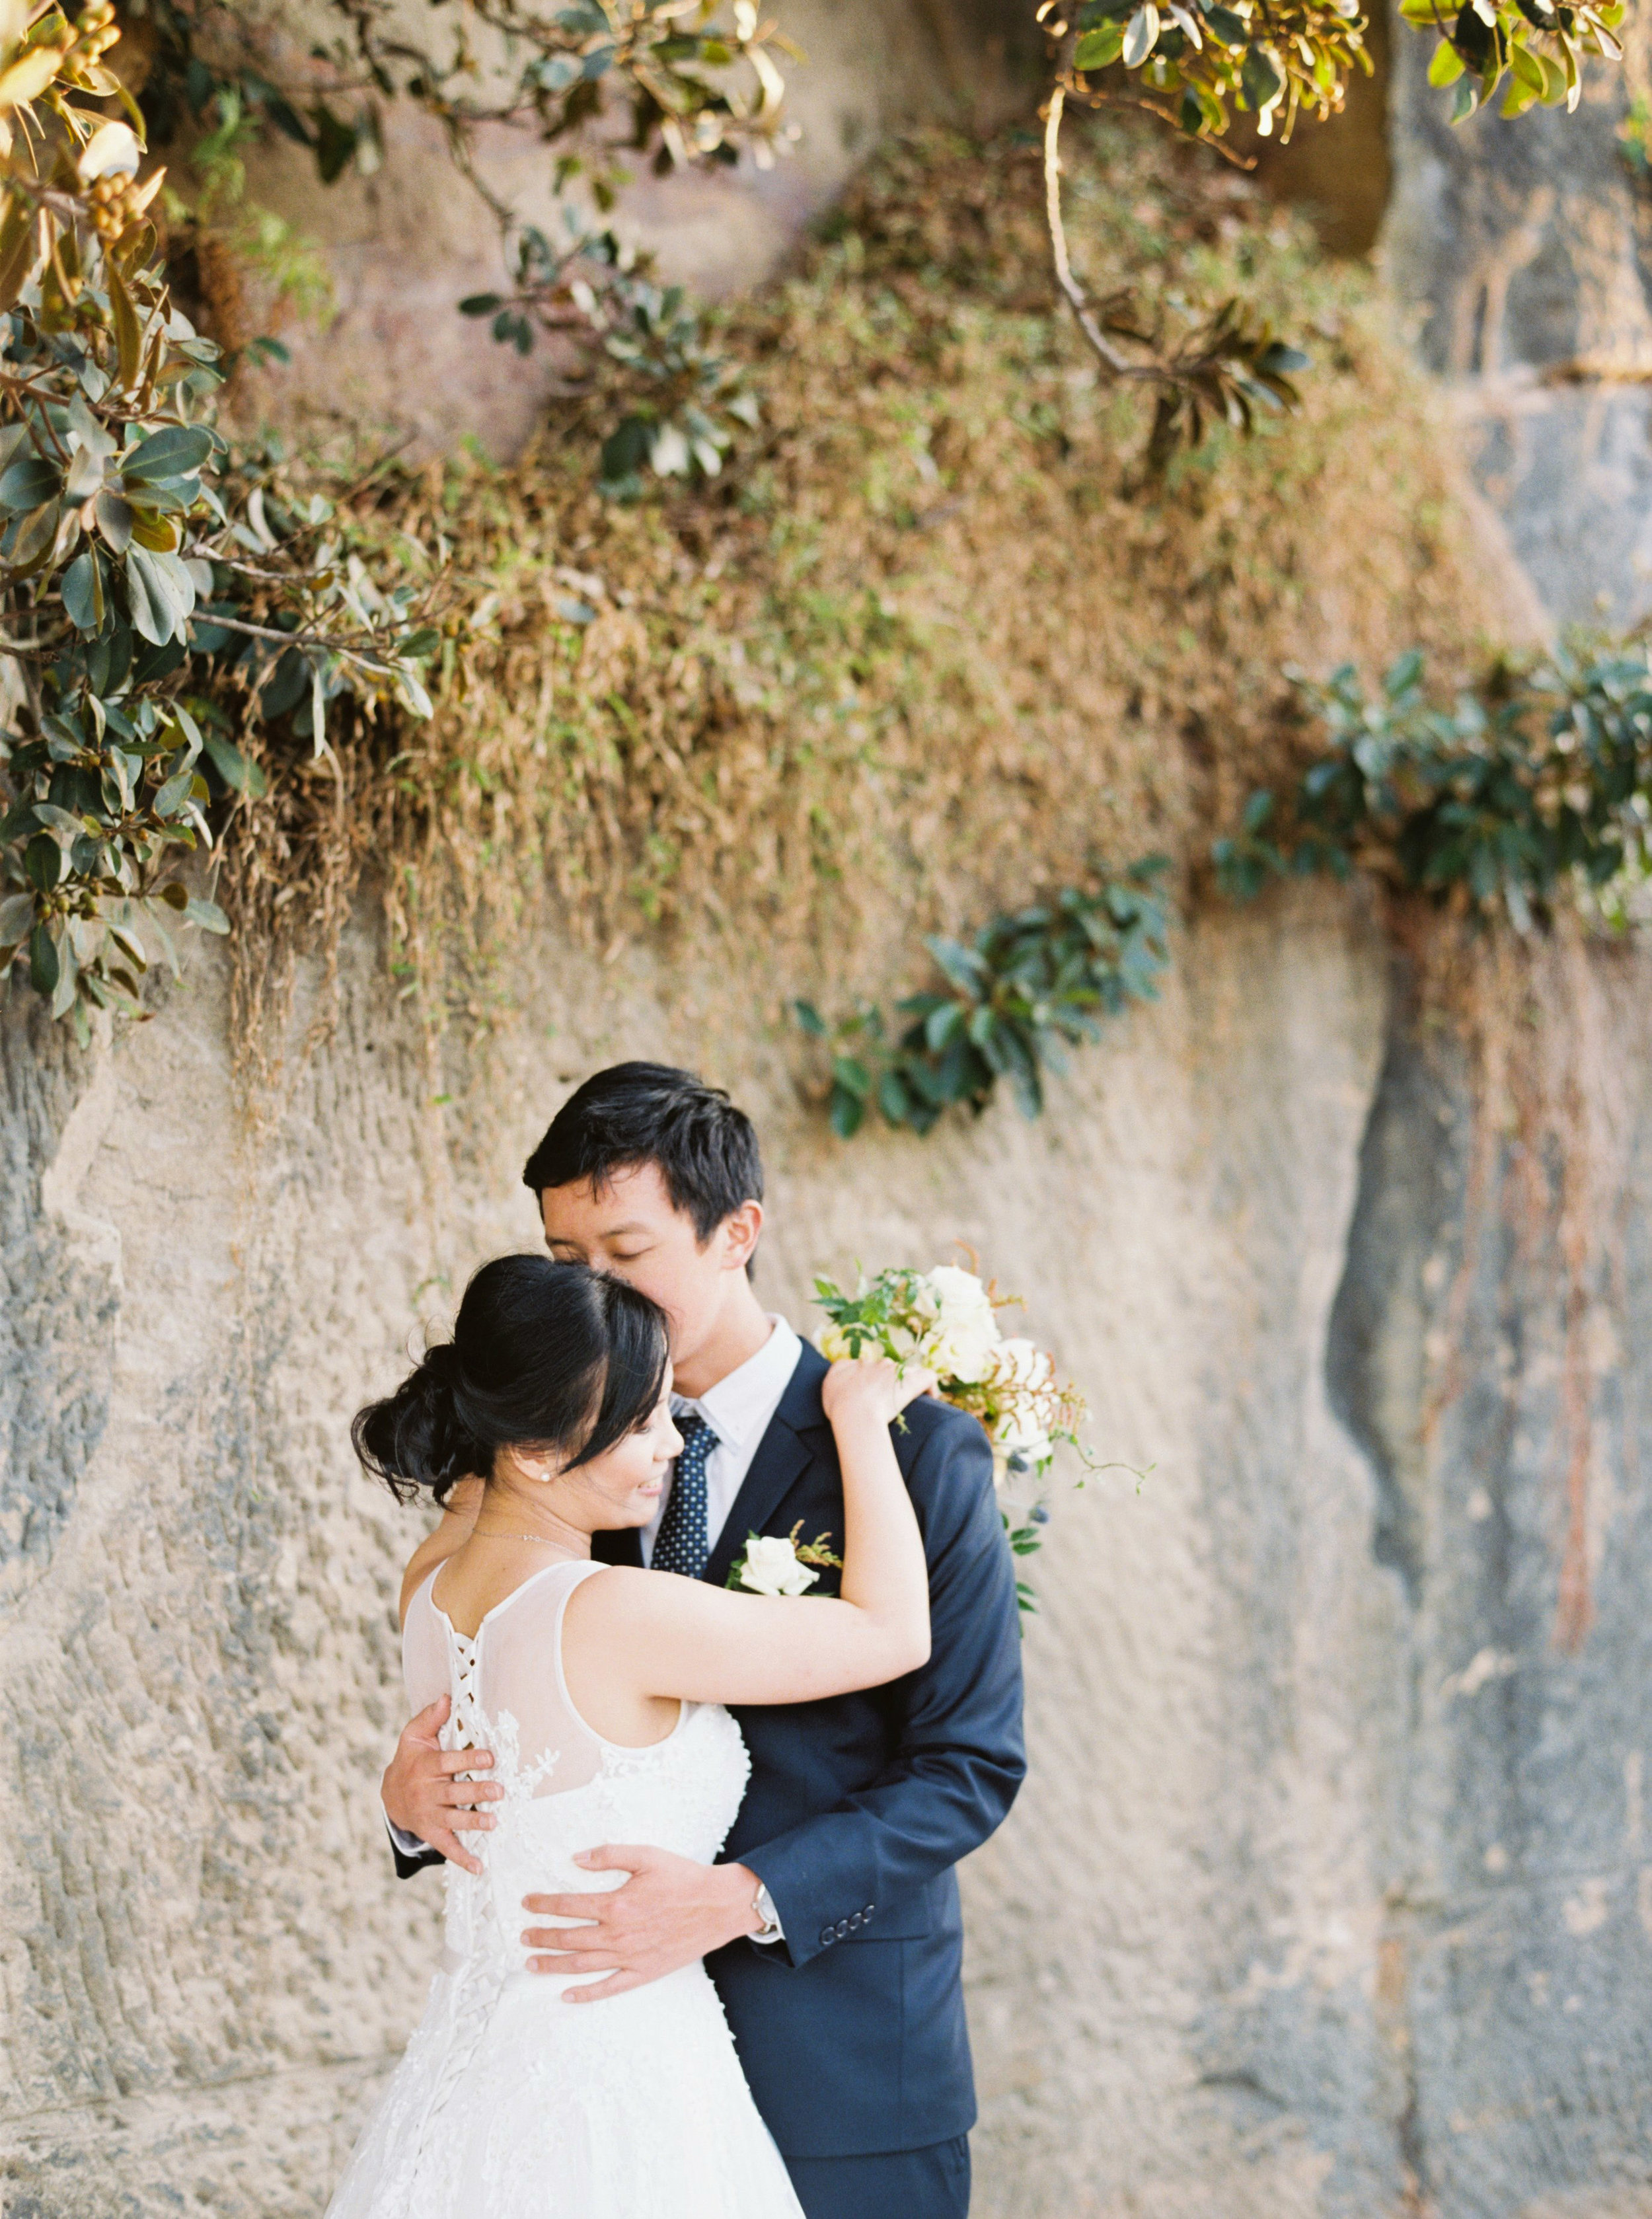 00009- Australia Sydney Wedding Photographer Sheri McMahon.jpg